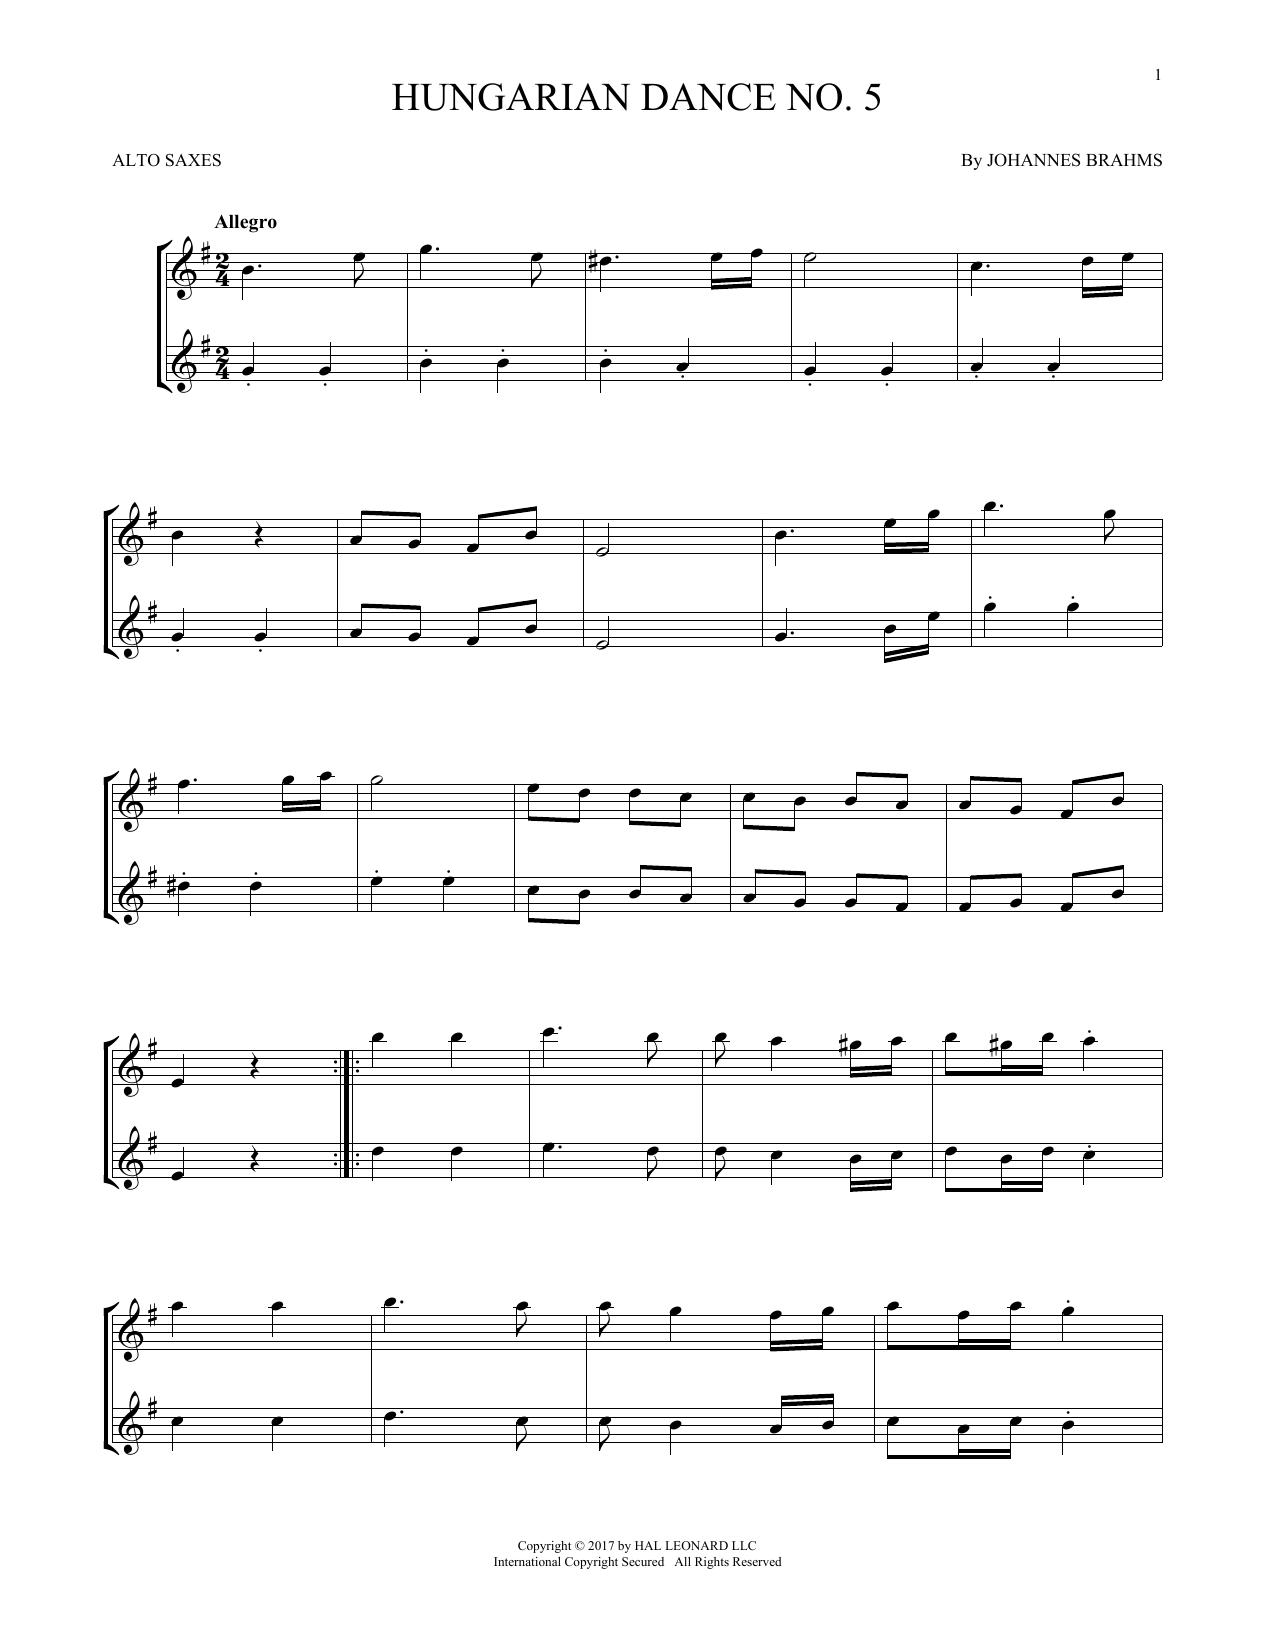 Hungarian Dance No. 5 (Alto Sax Duet)